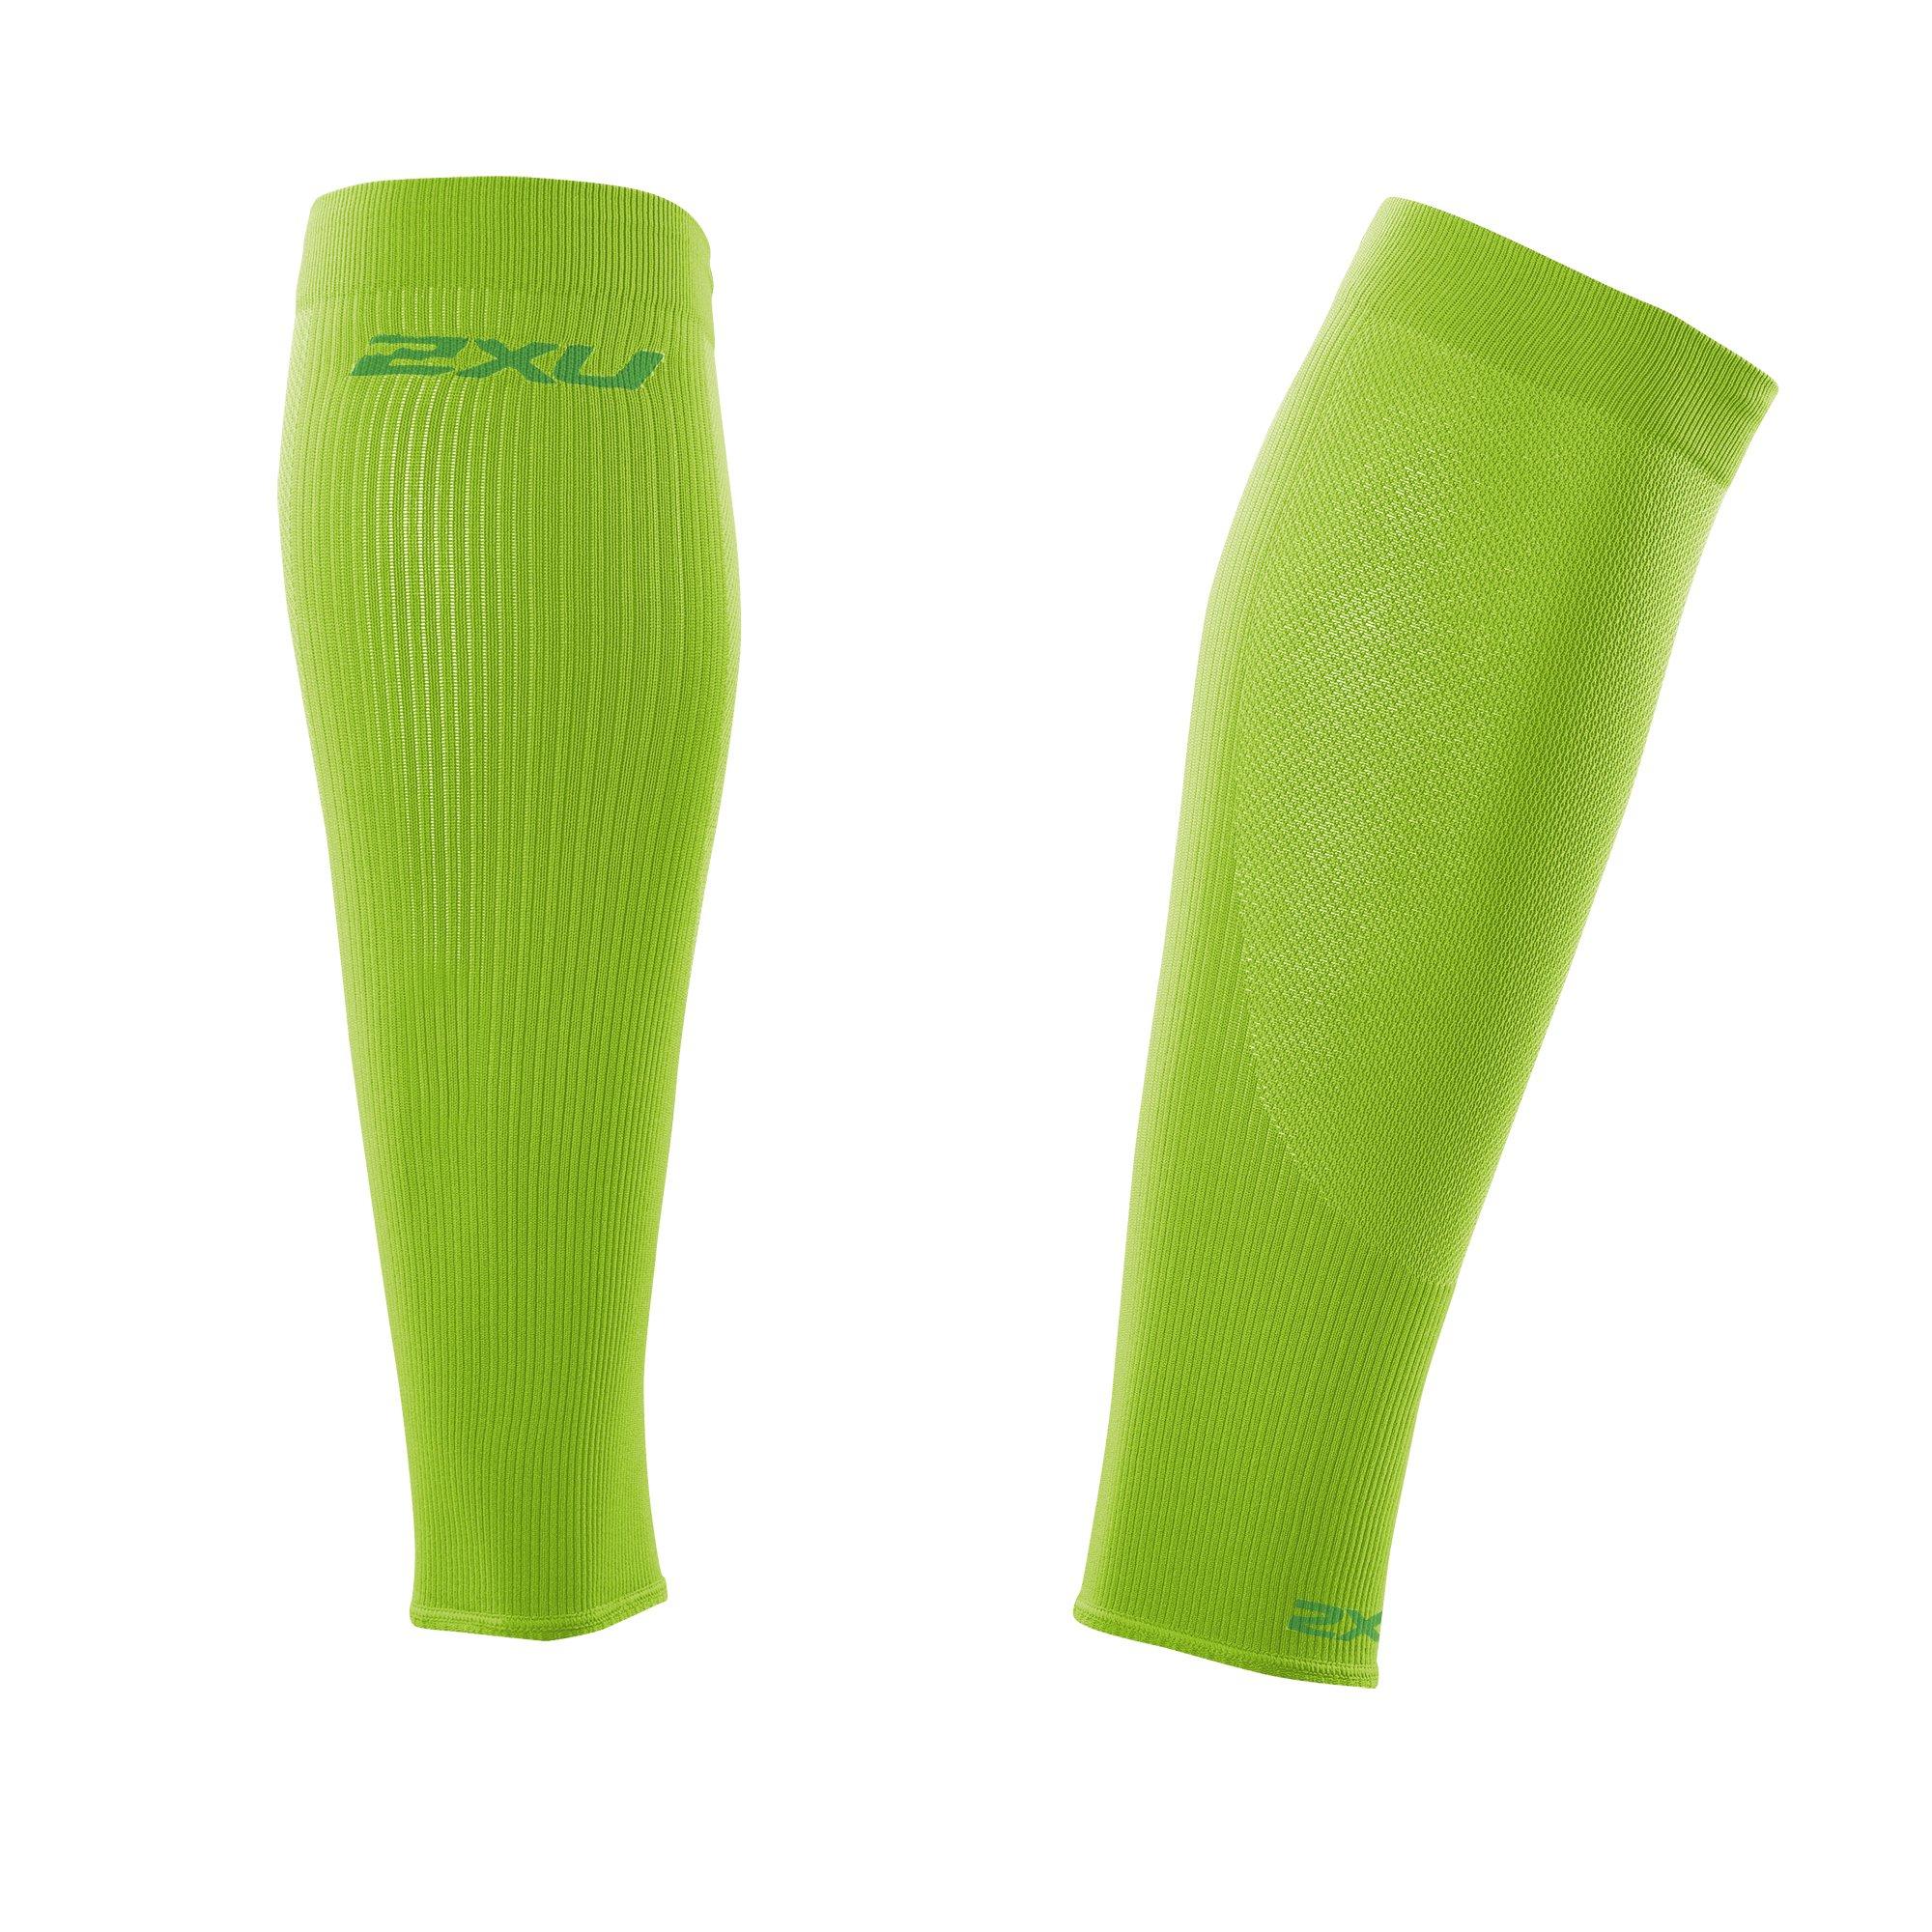 2XU Compression performance Sleeves, Fluro Green/Green, X-Small